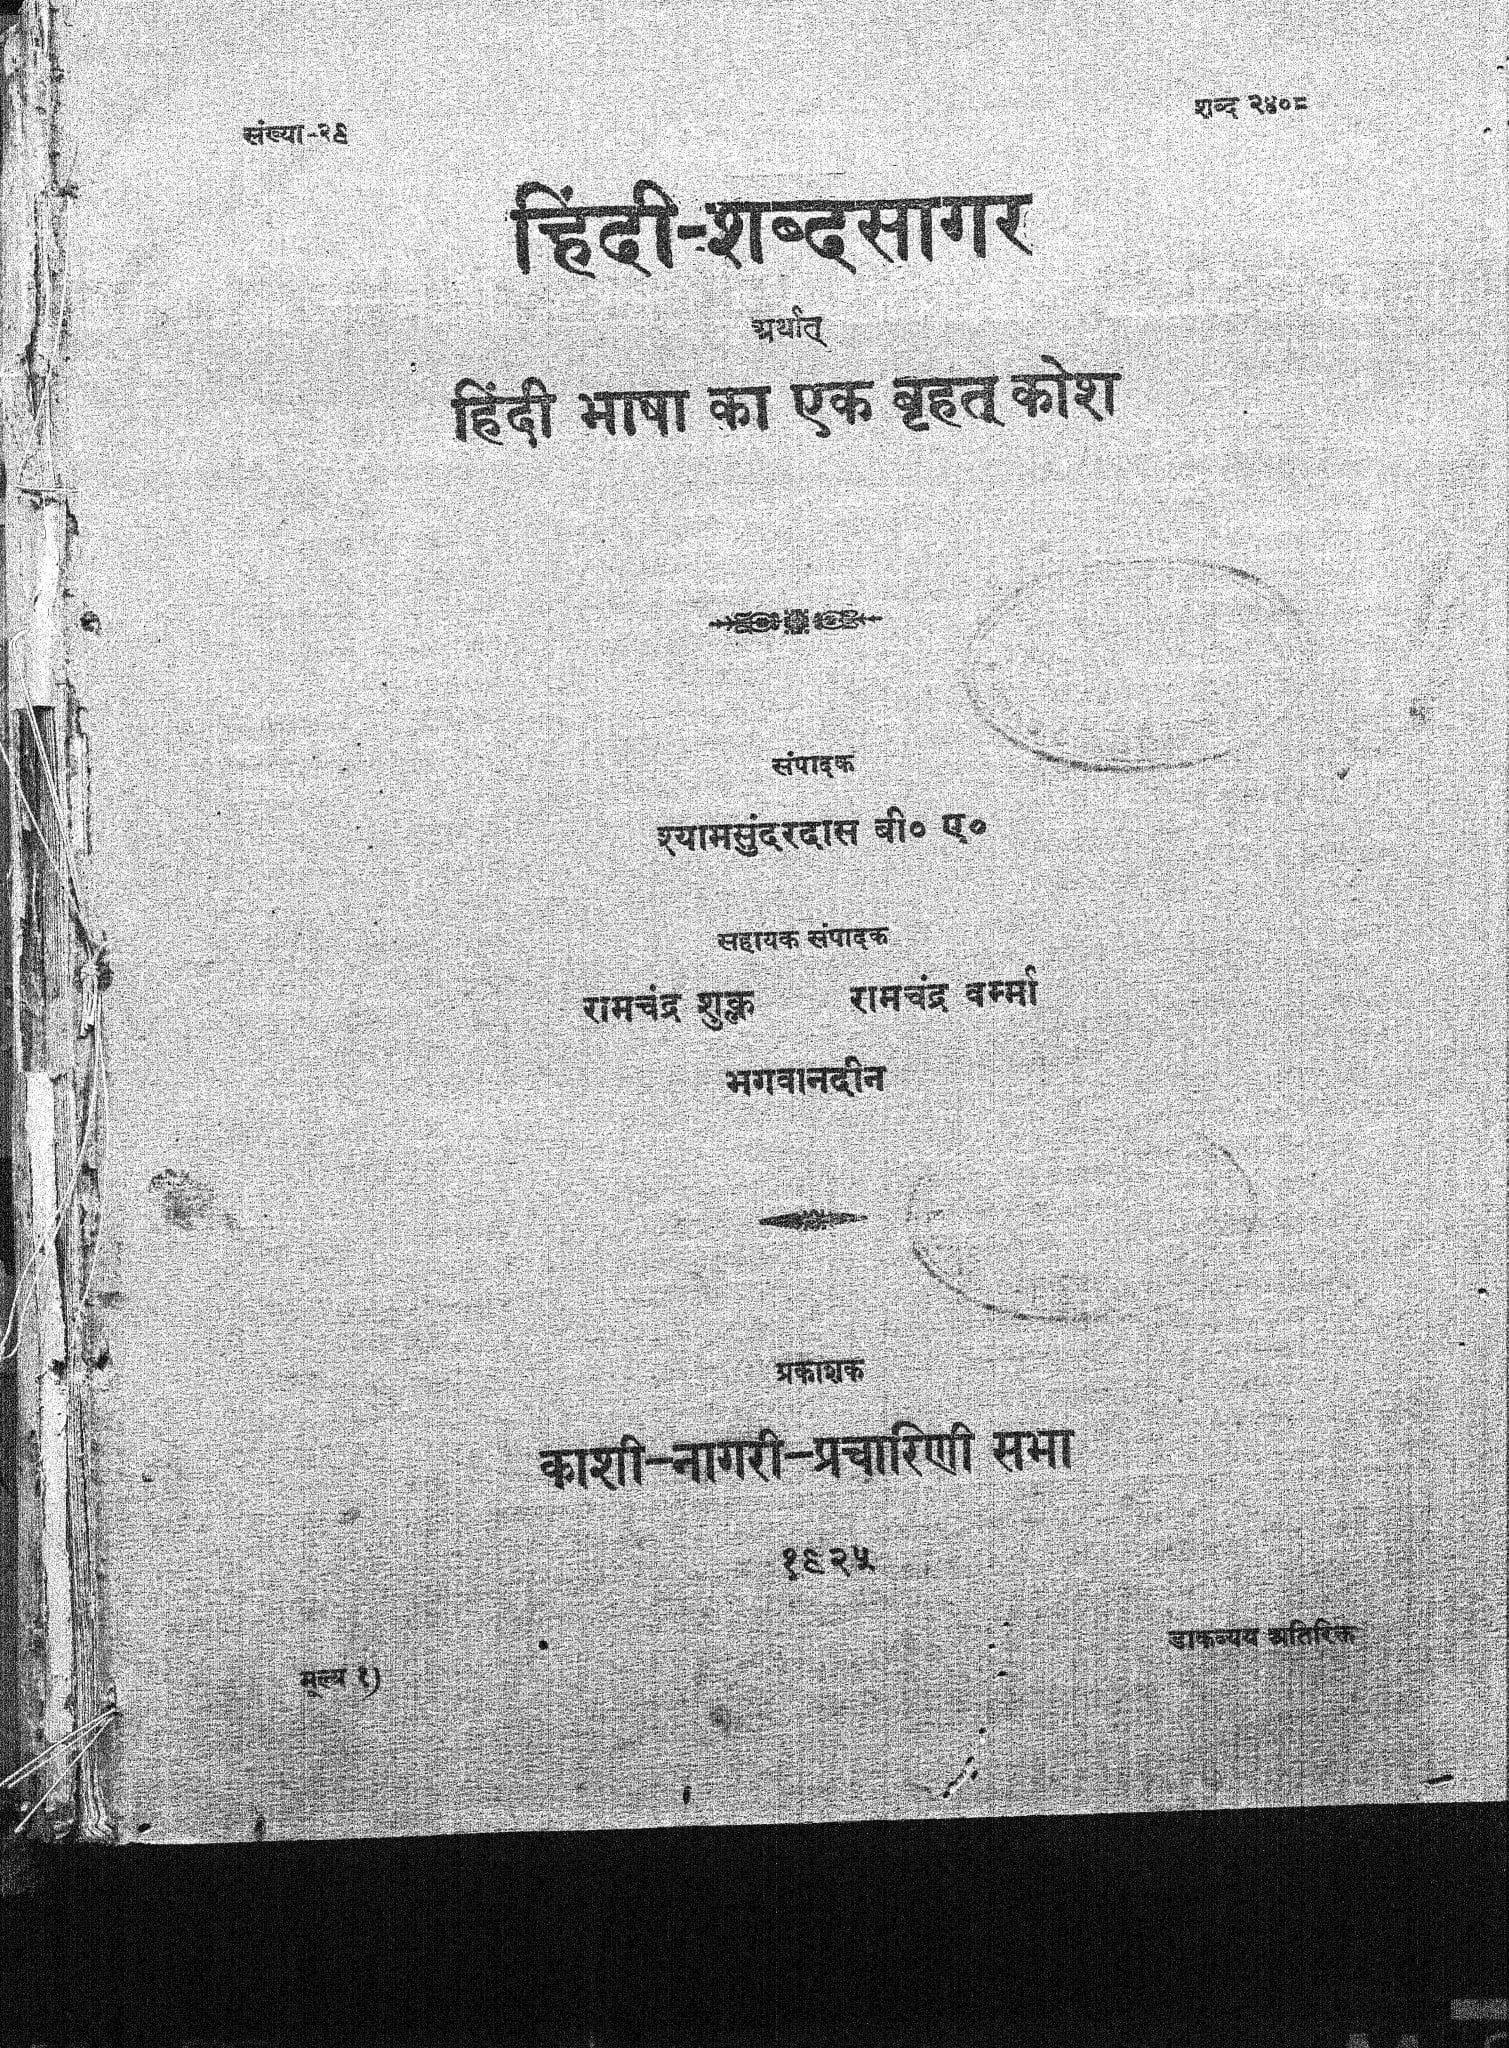 Book Image : हिंदी - शब्दसागर सं.२९ - Hindi Sabdhsagar No 29